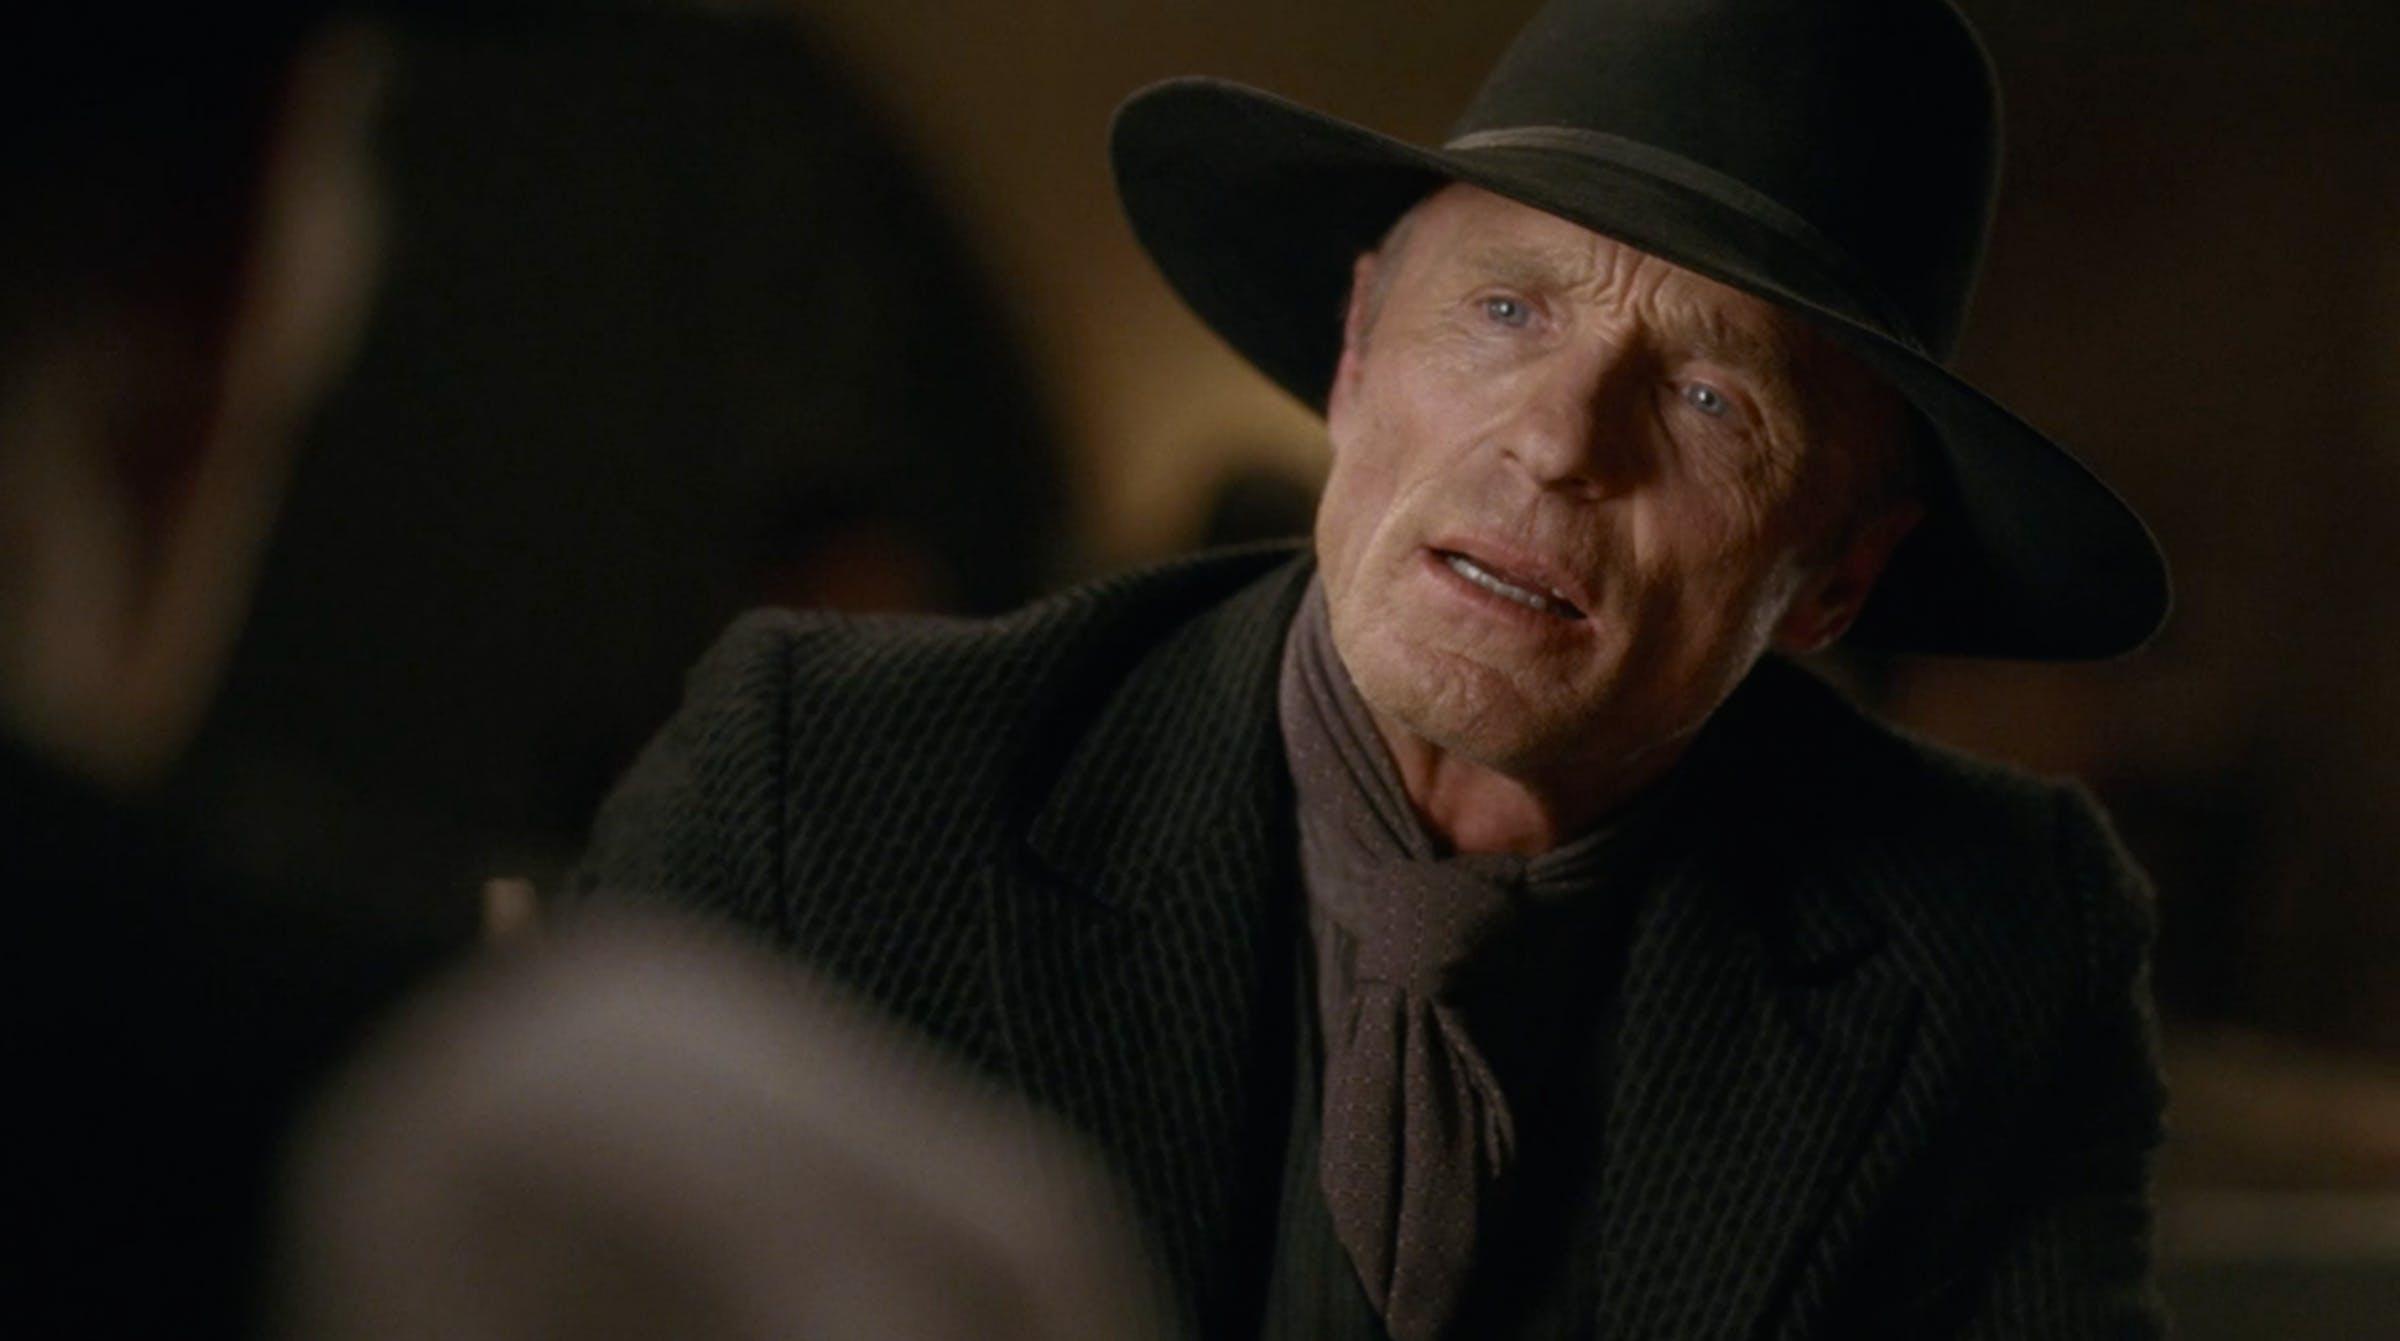 Westworld season 2 cast: The Man in Black will be back